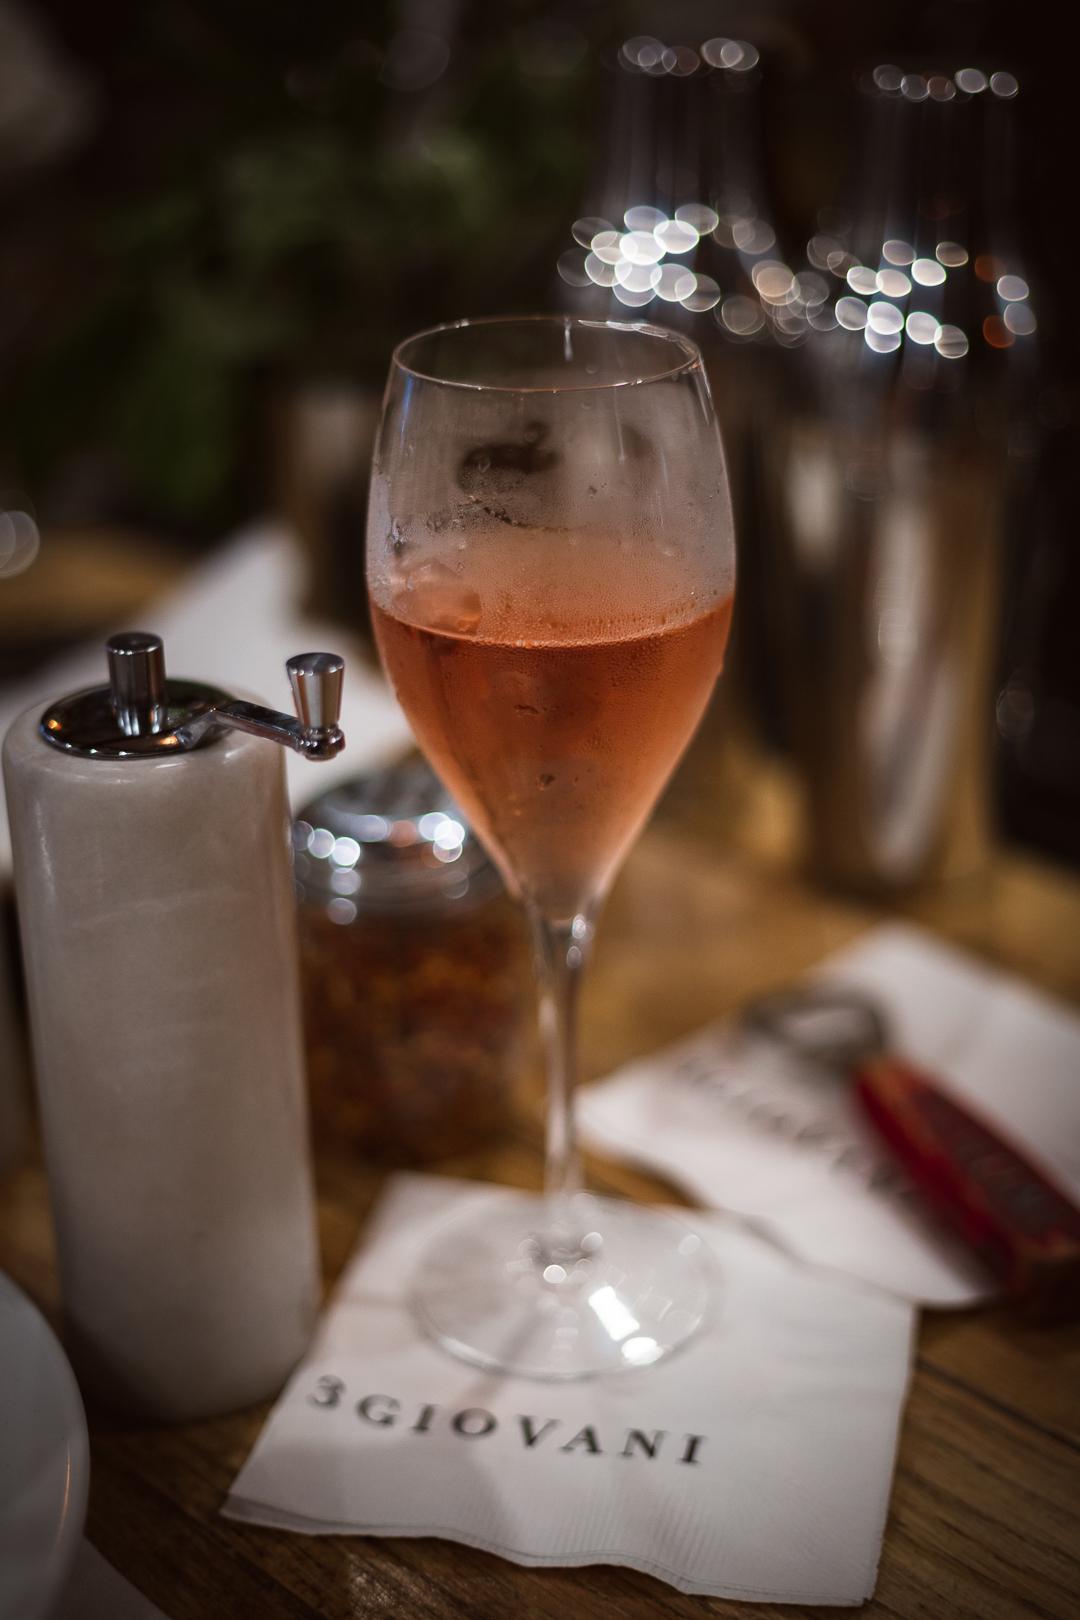 3 Giovani - NYC Italian Restaurant - Wine.jpg